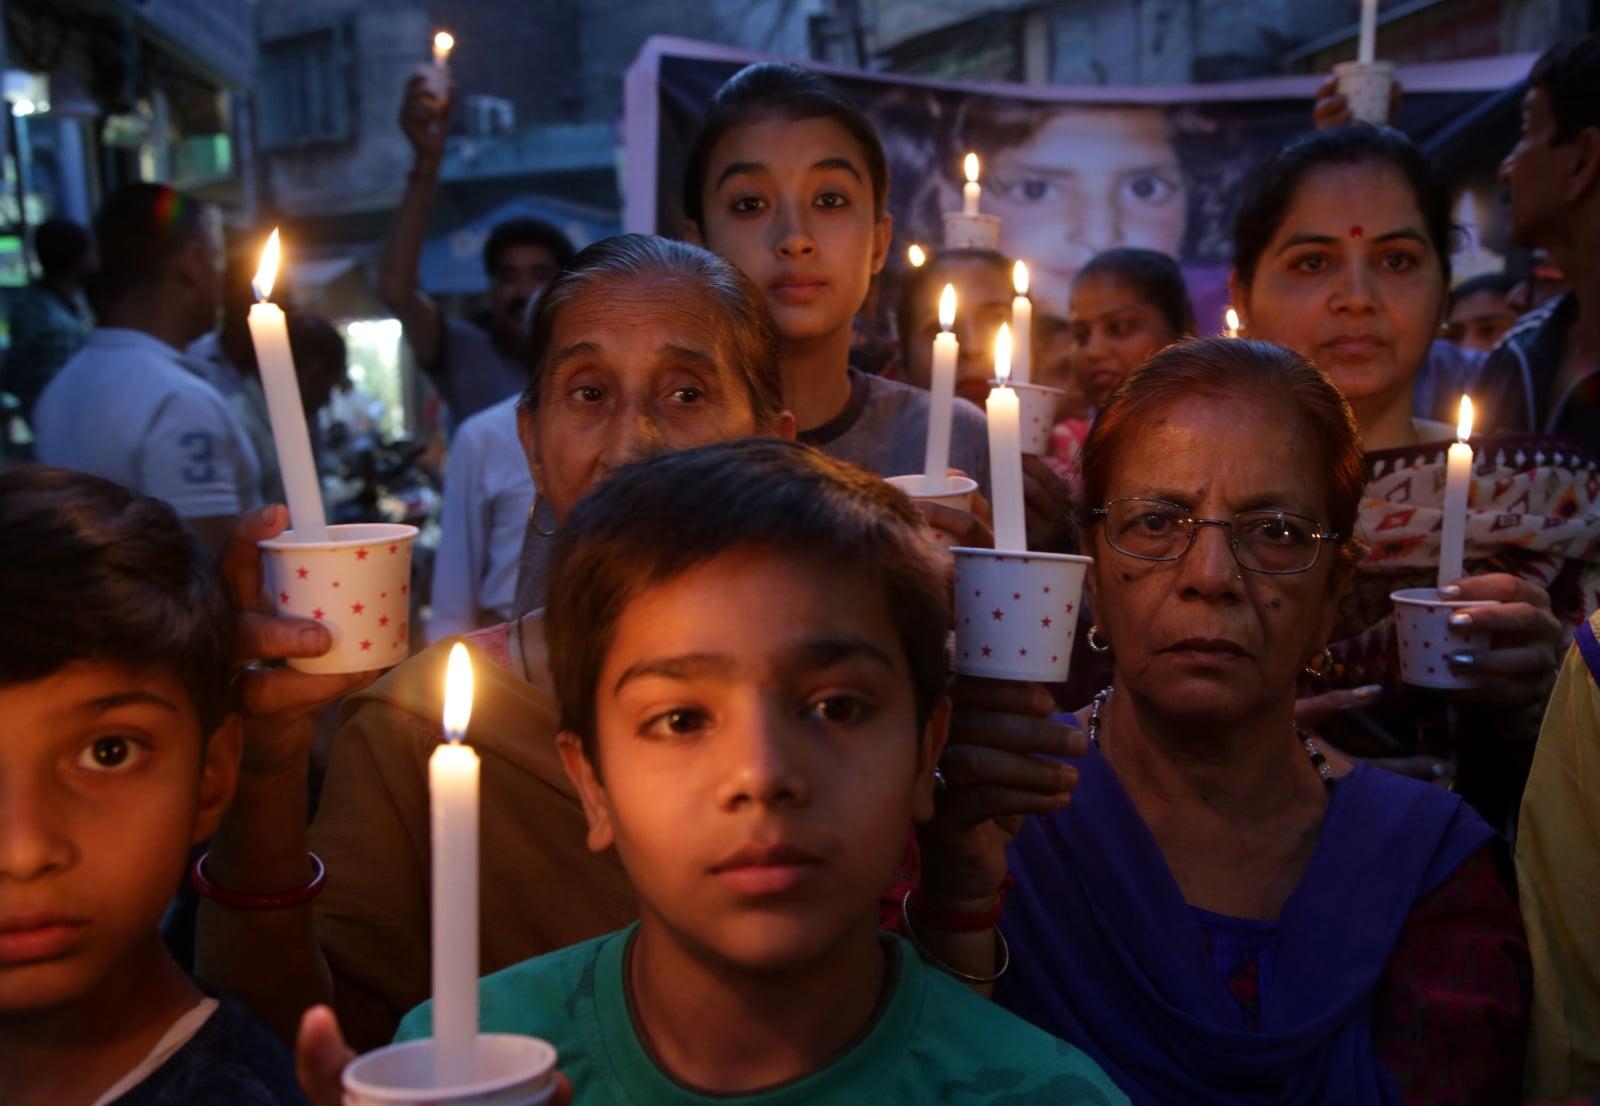 Protest dzieci w Indiach fot. EPA/JAIPAL SINGH